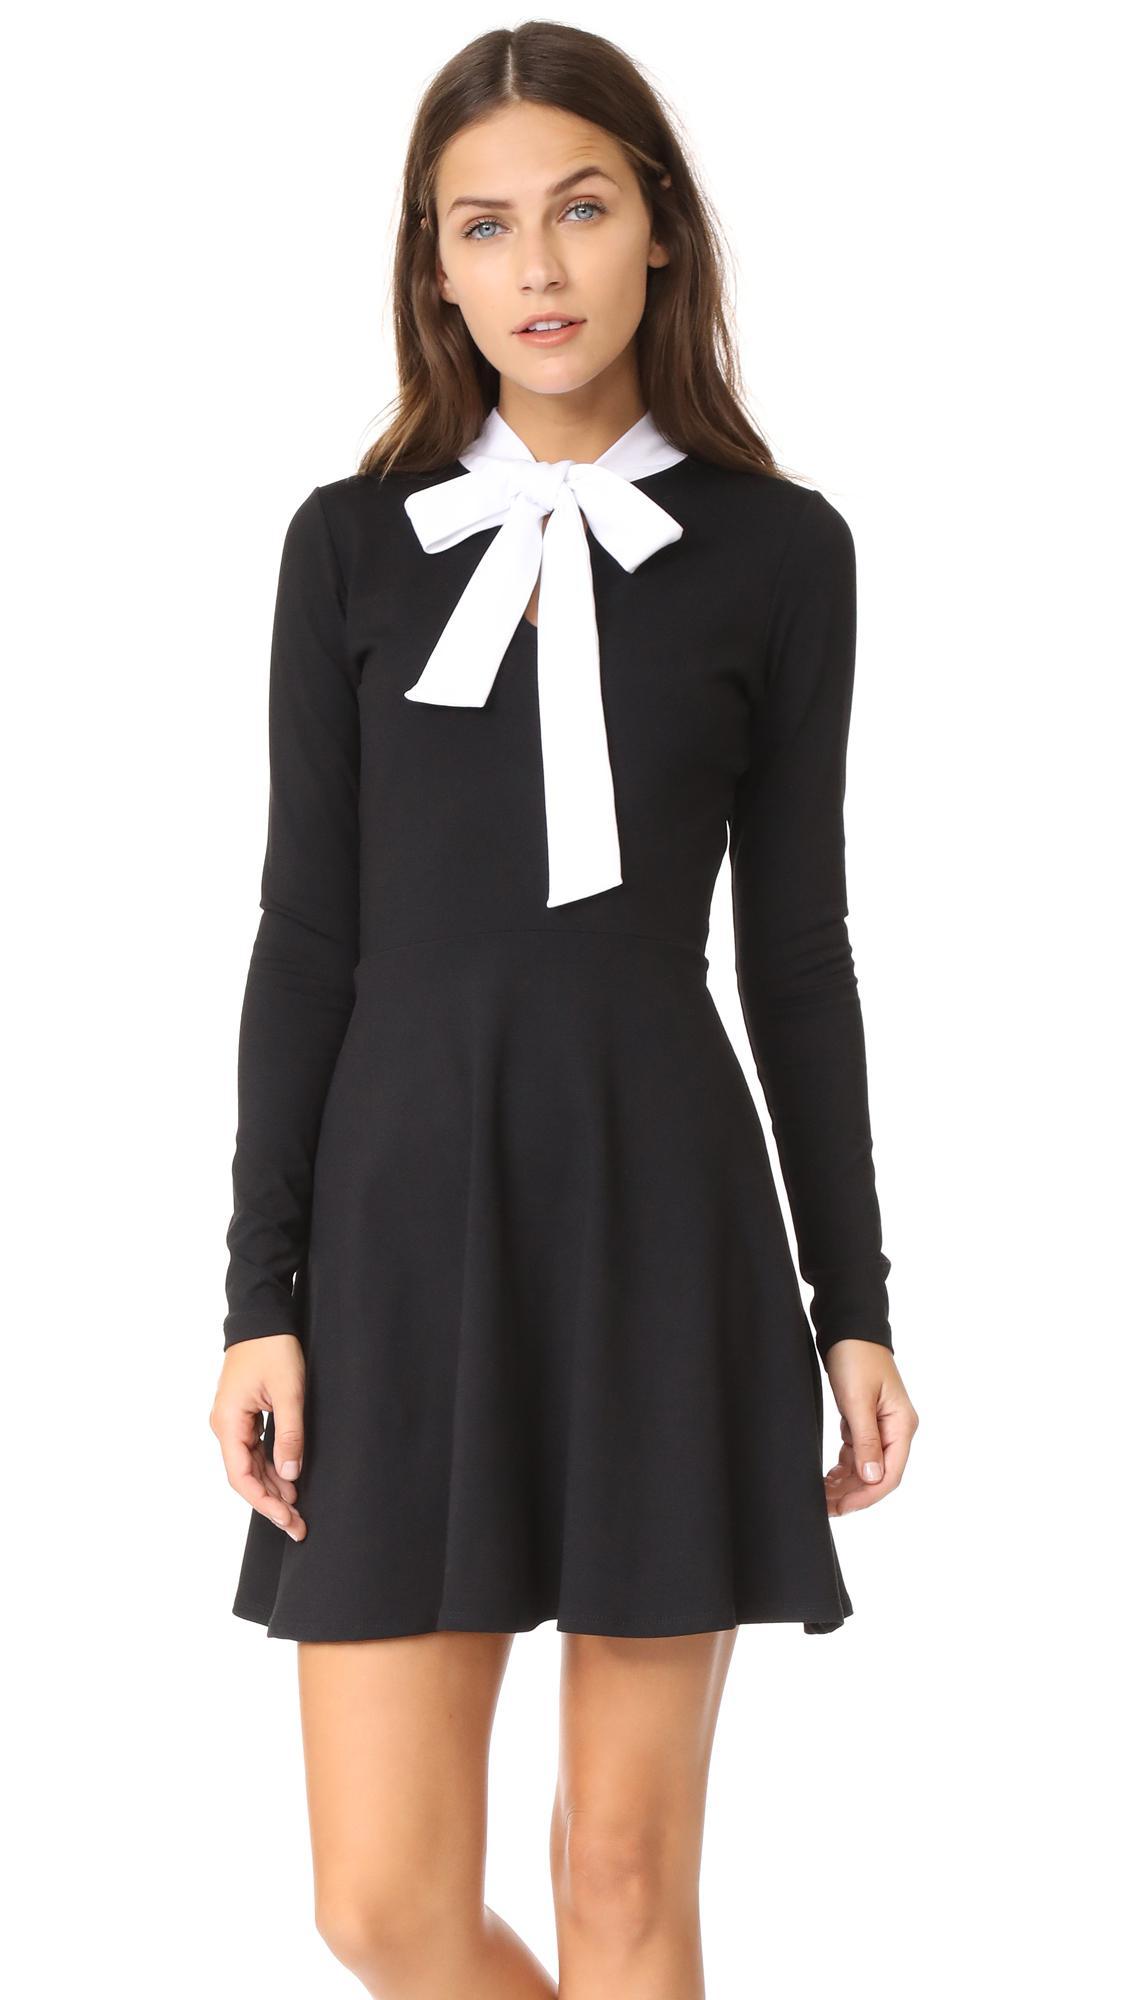 5b8f310757 Susana Monaco Neive Dress in Black - Lyst